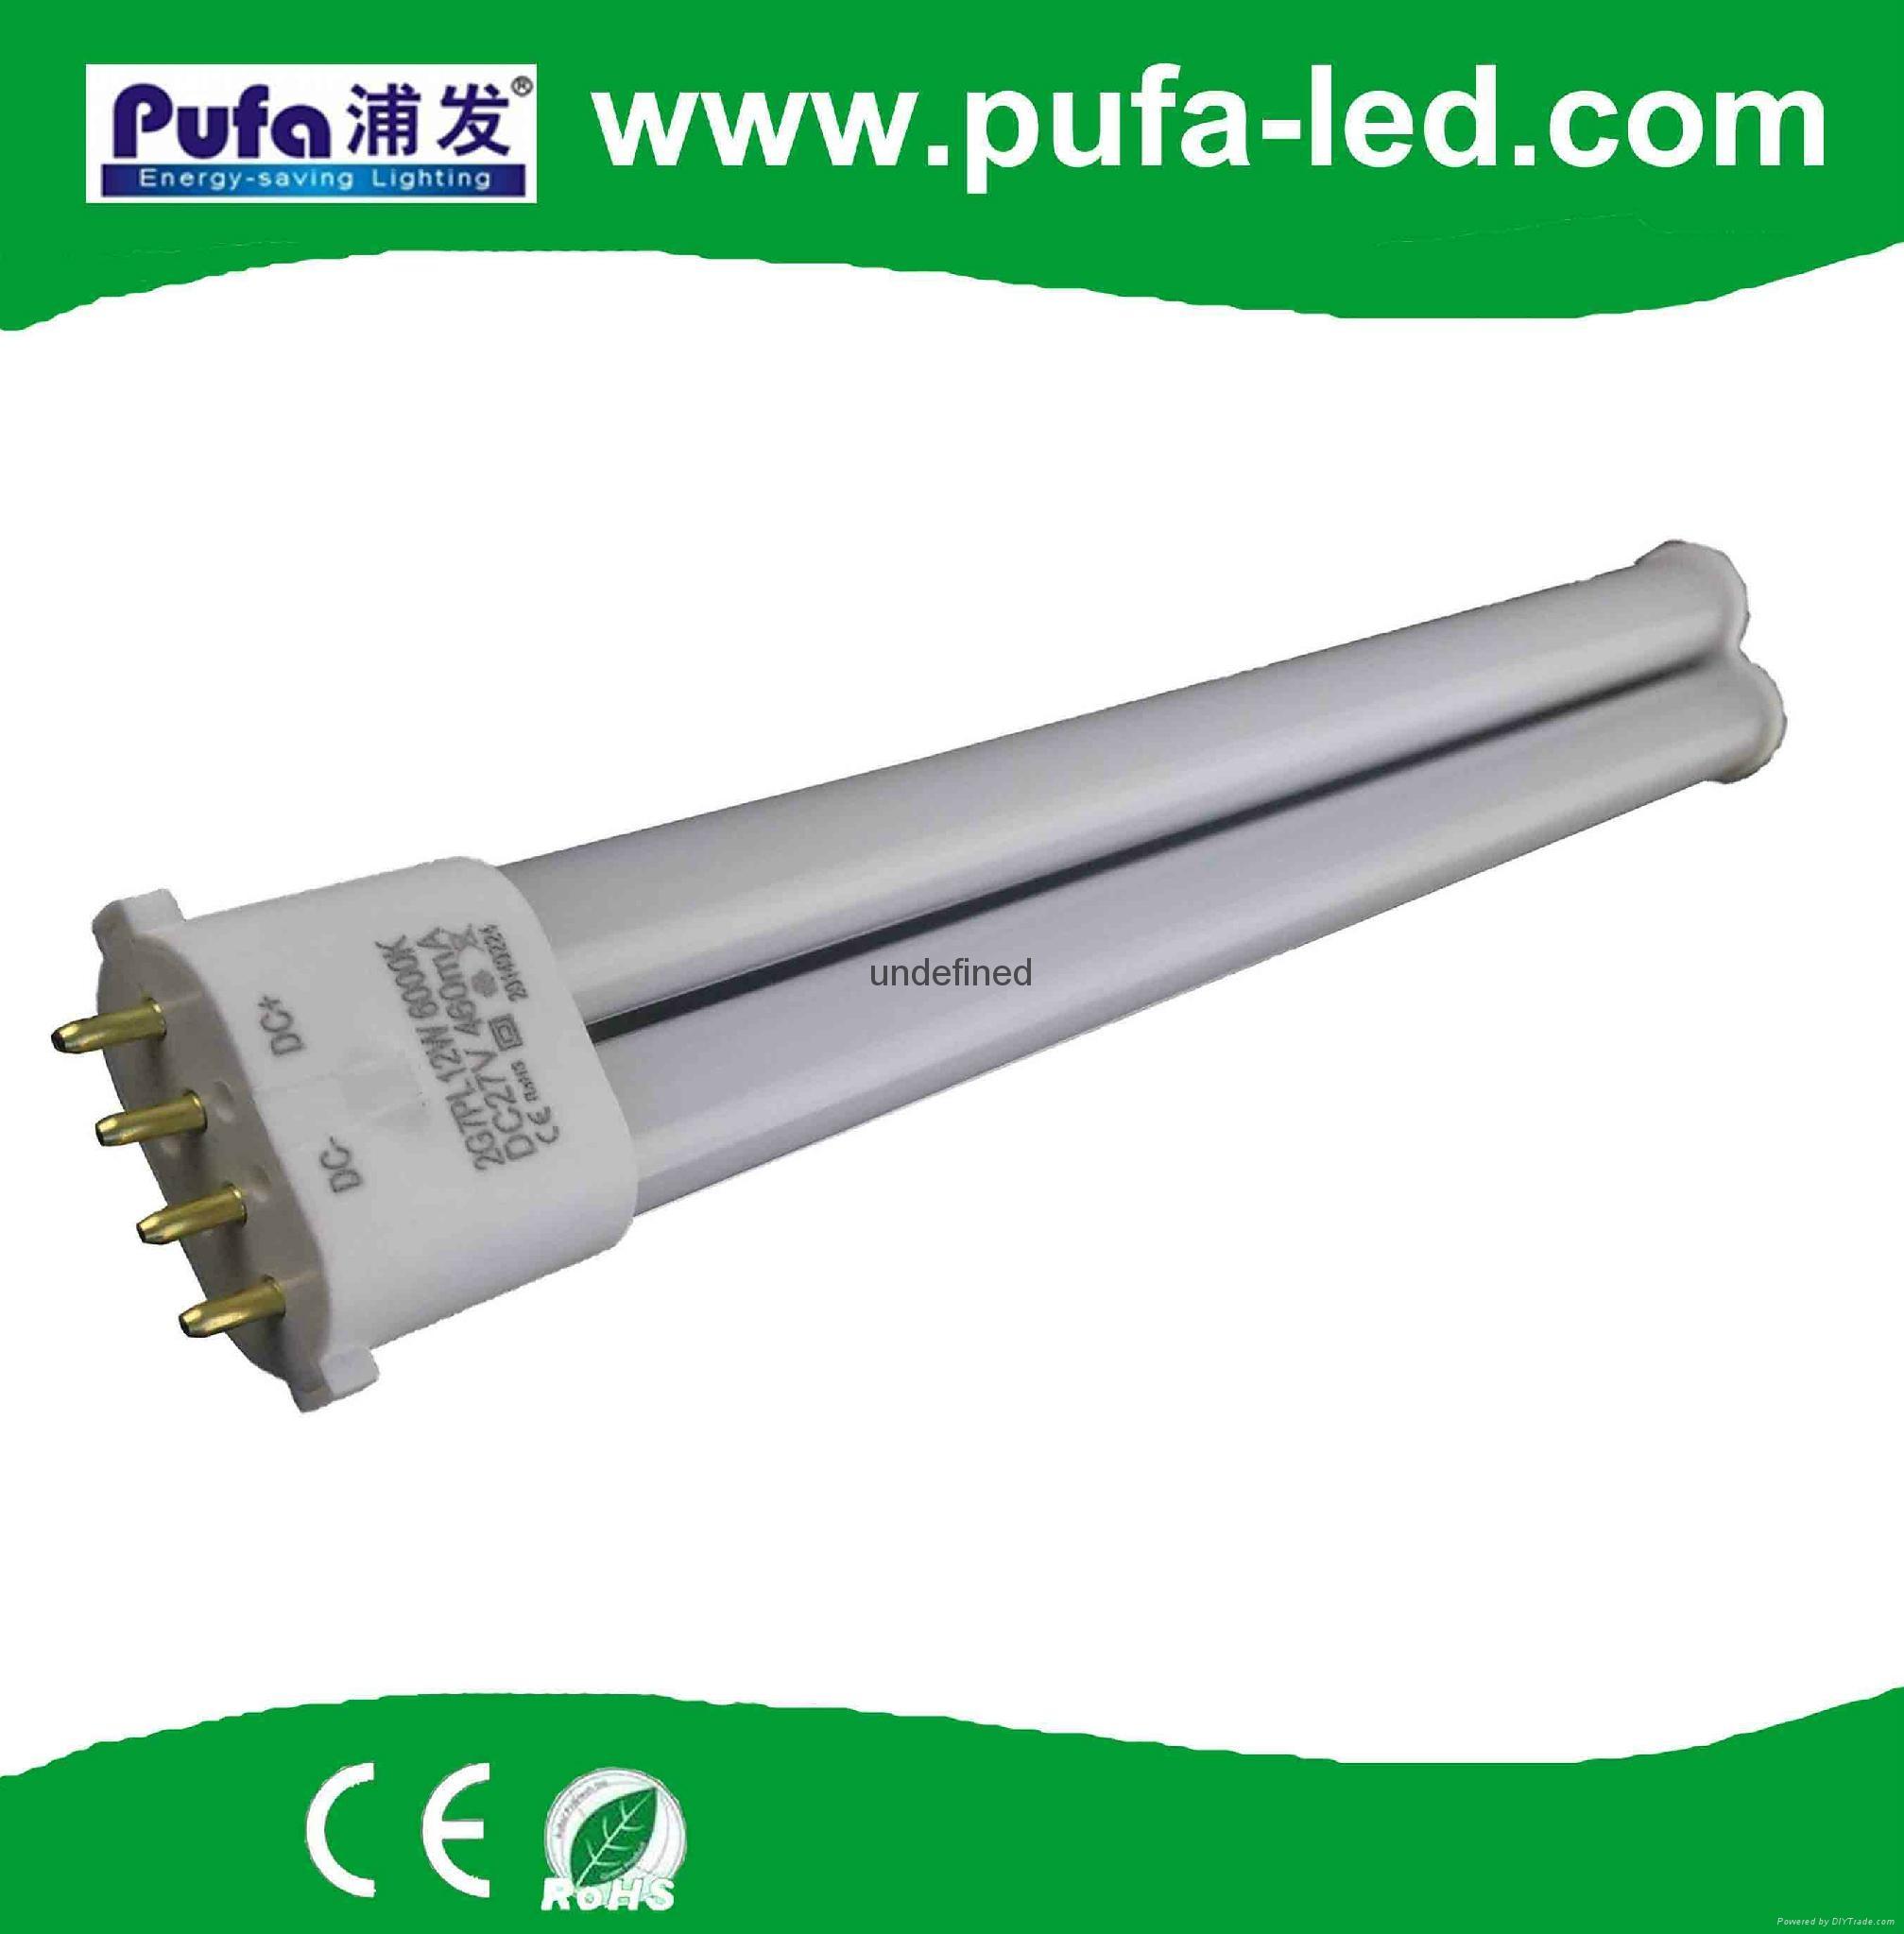 2G7 LED 內置電源橫插燈 5W 1